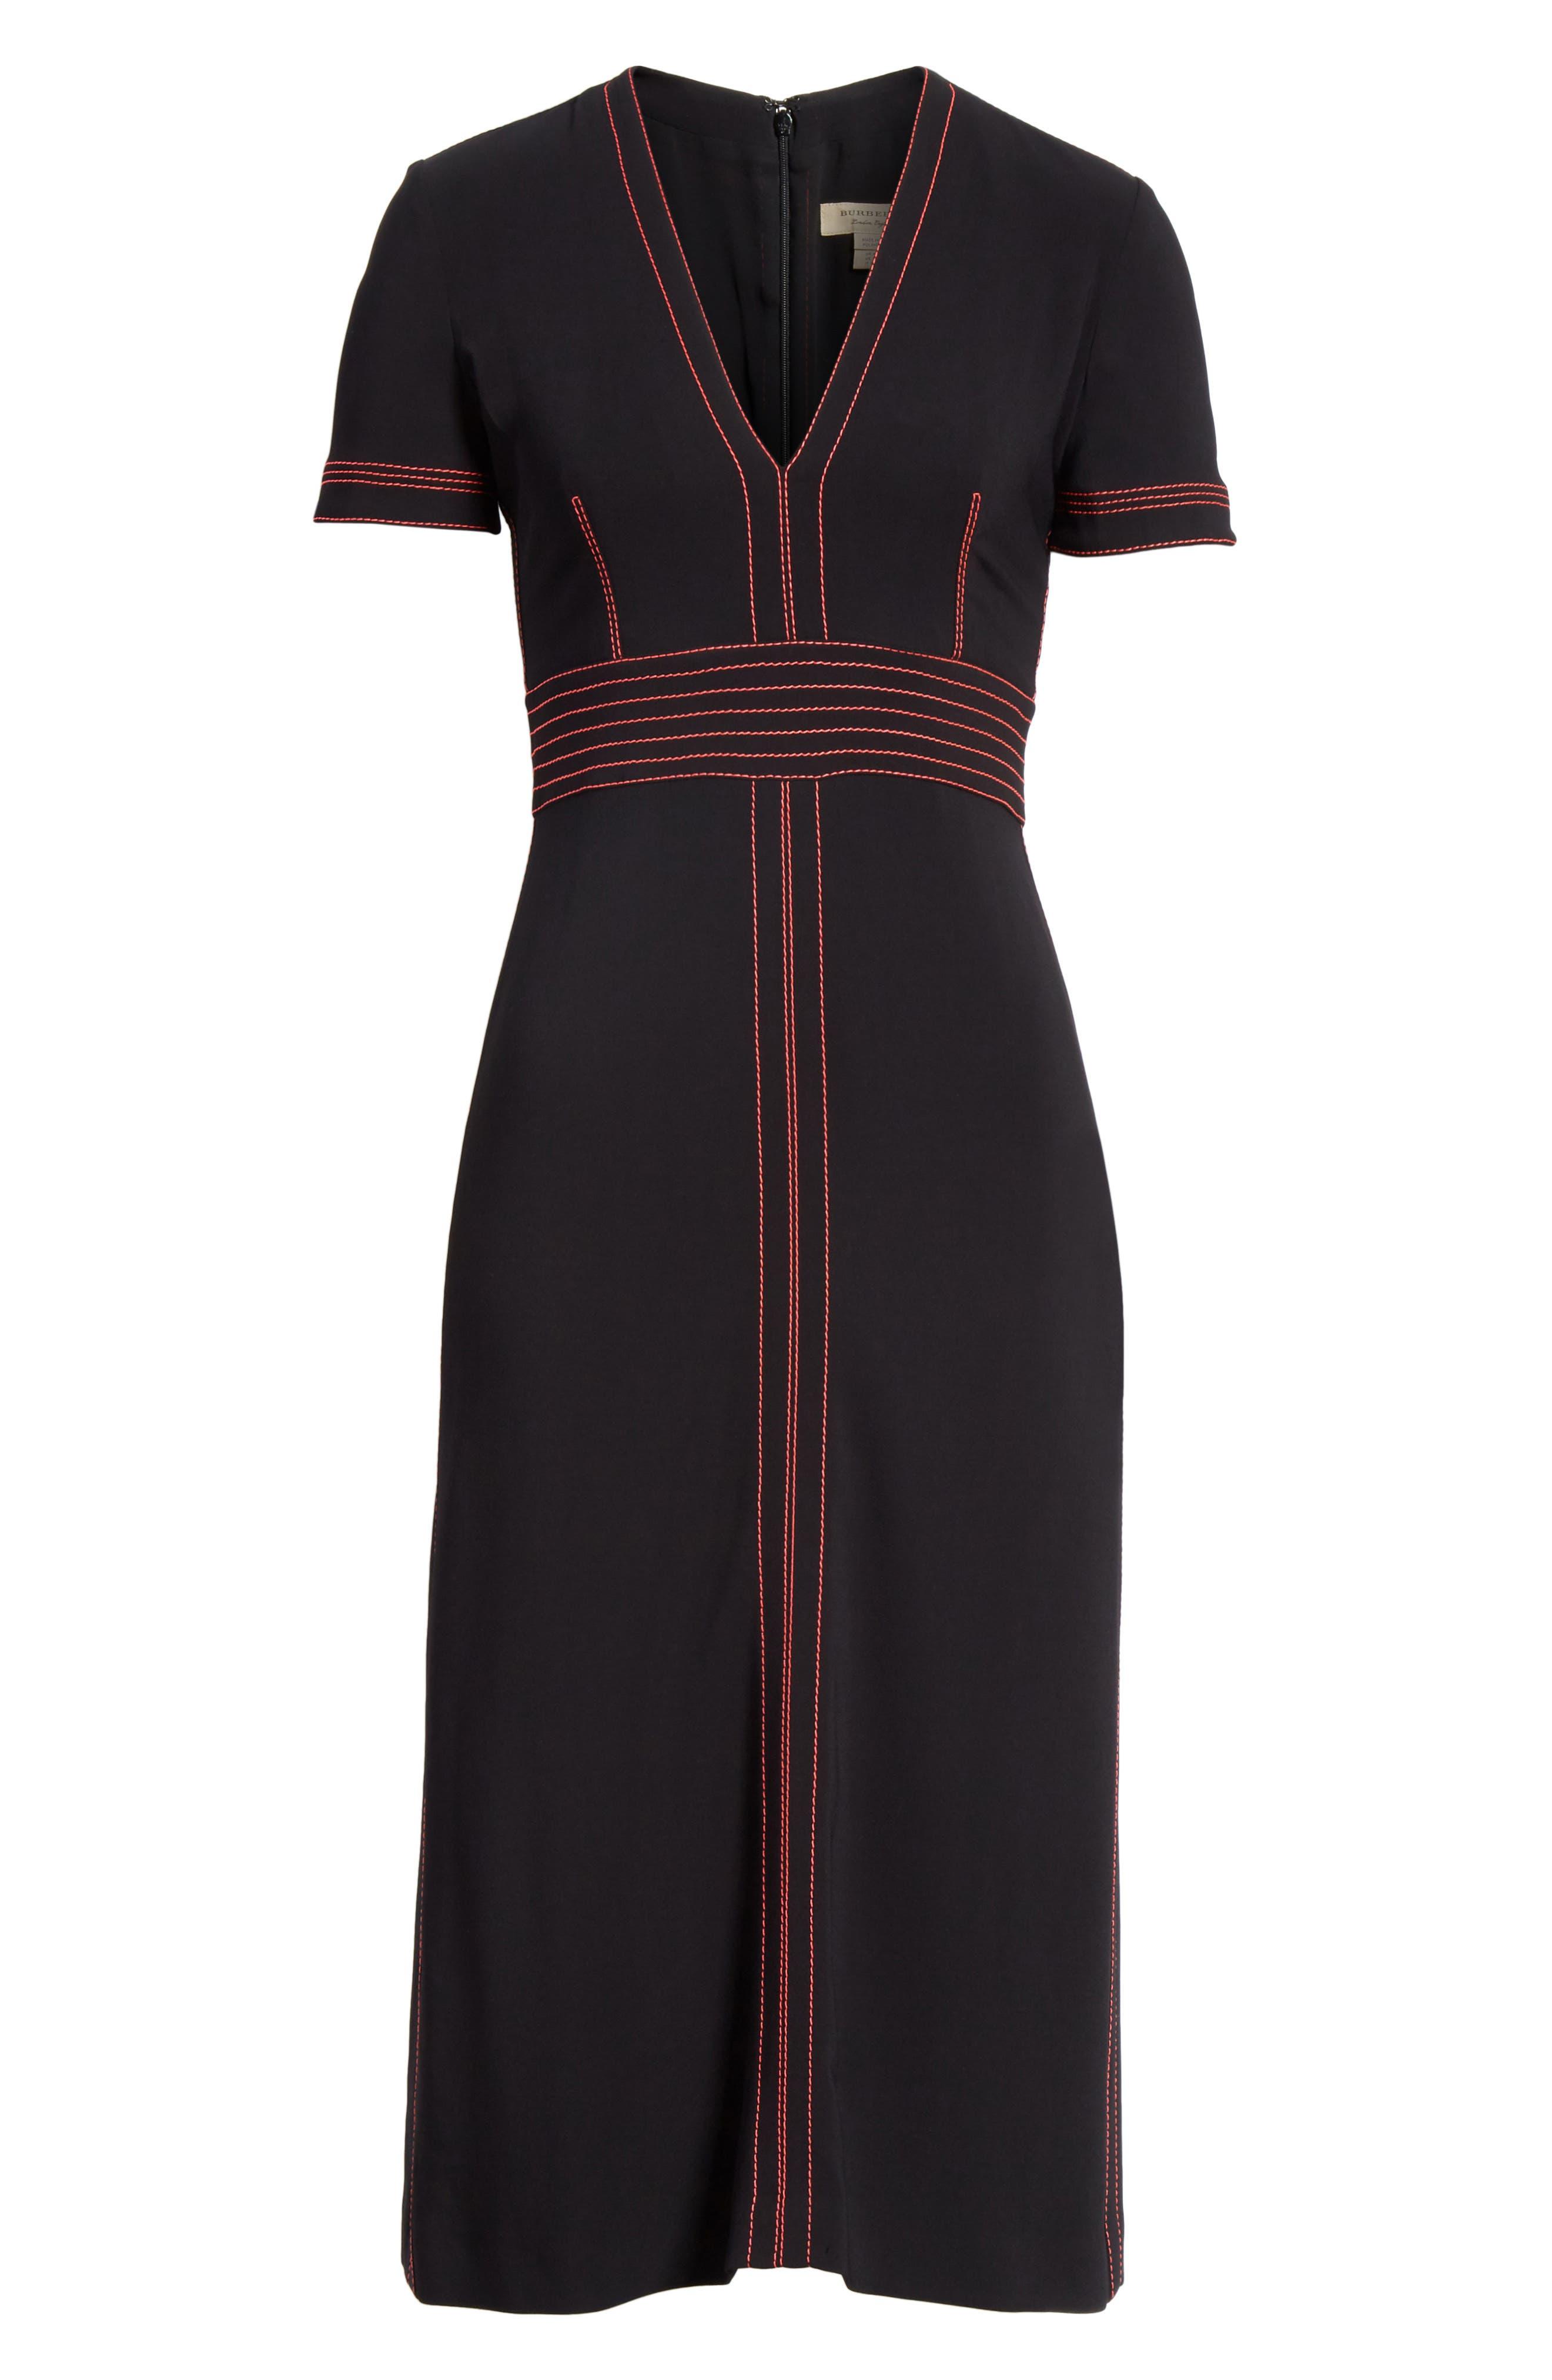 Benni Topstitched Midi Dress,                             Alternate thumbnail 6, color,                             001